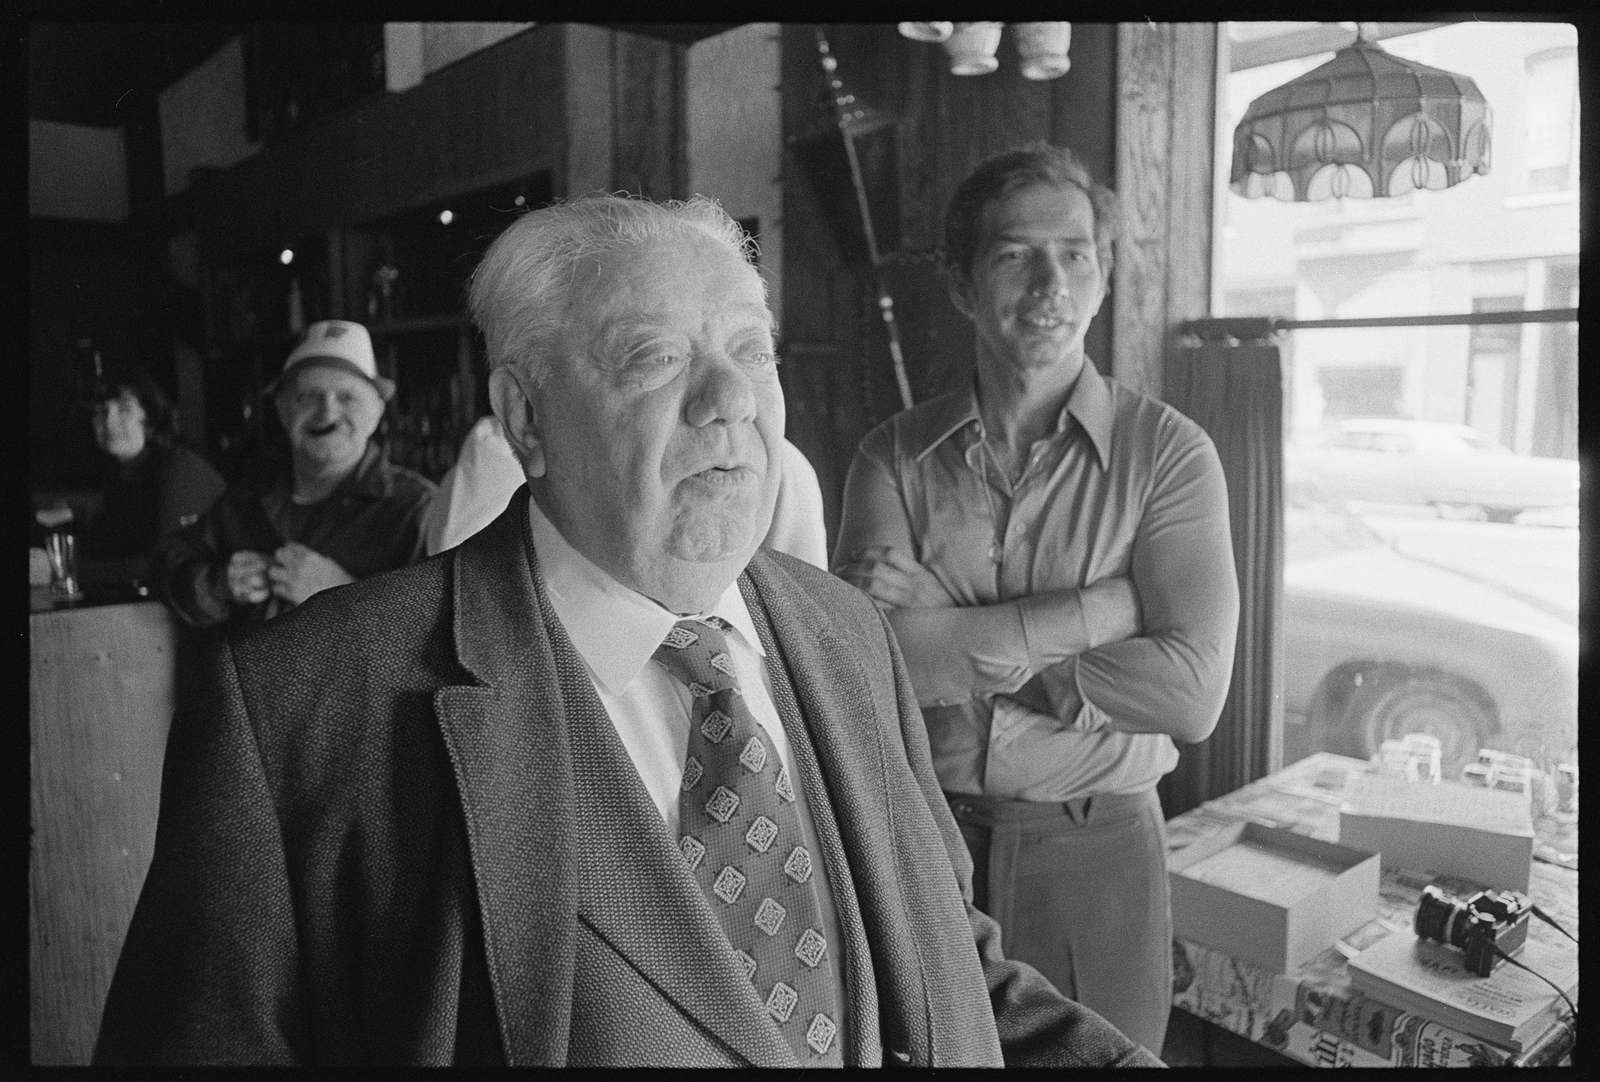 Mr. Roland Libonati, Chicago, Illinois; morra-players at Mama Sue's Restaurant, Chicago, Illinois